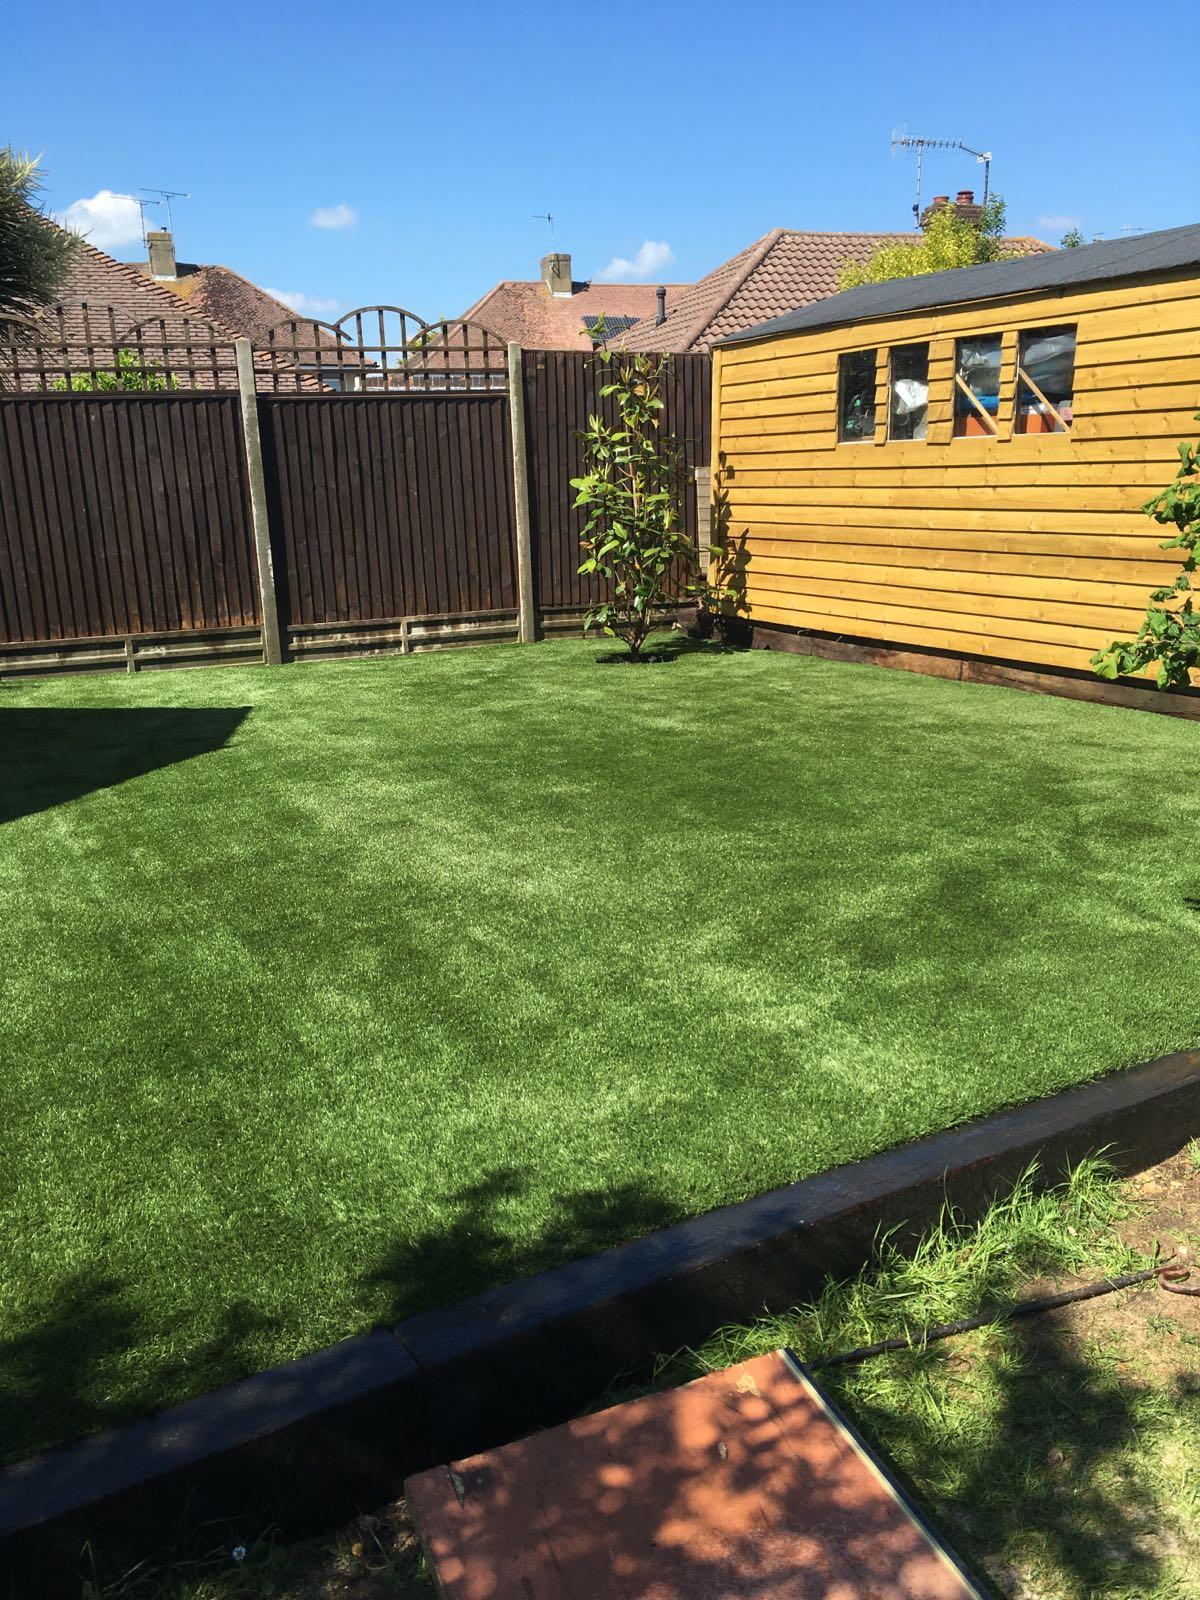 100 put grass in backyard artificial grass for lawns dogs